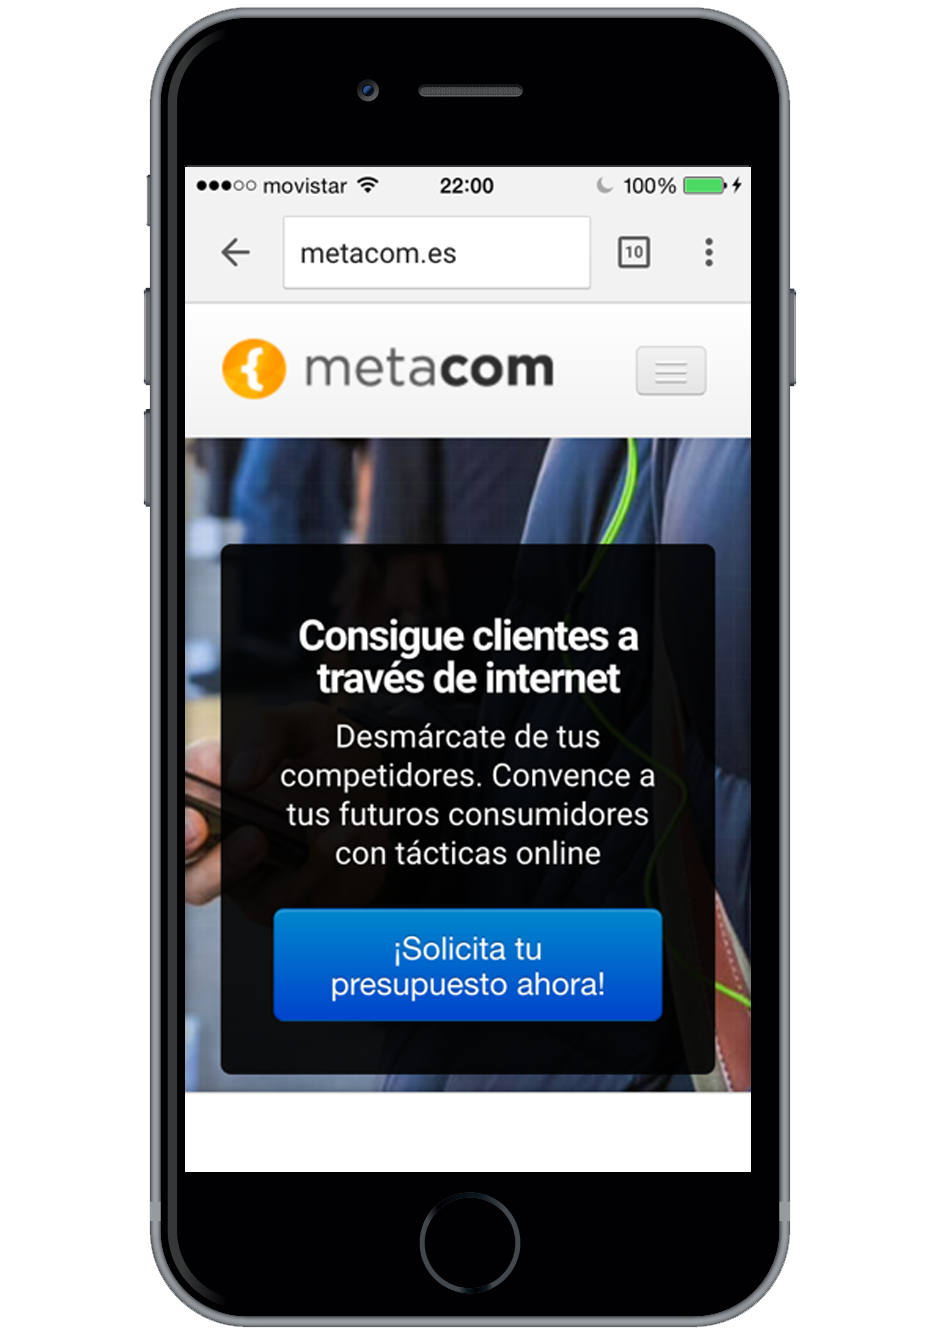 empresa-de-servicios-de-internet-responsive-design-metacom